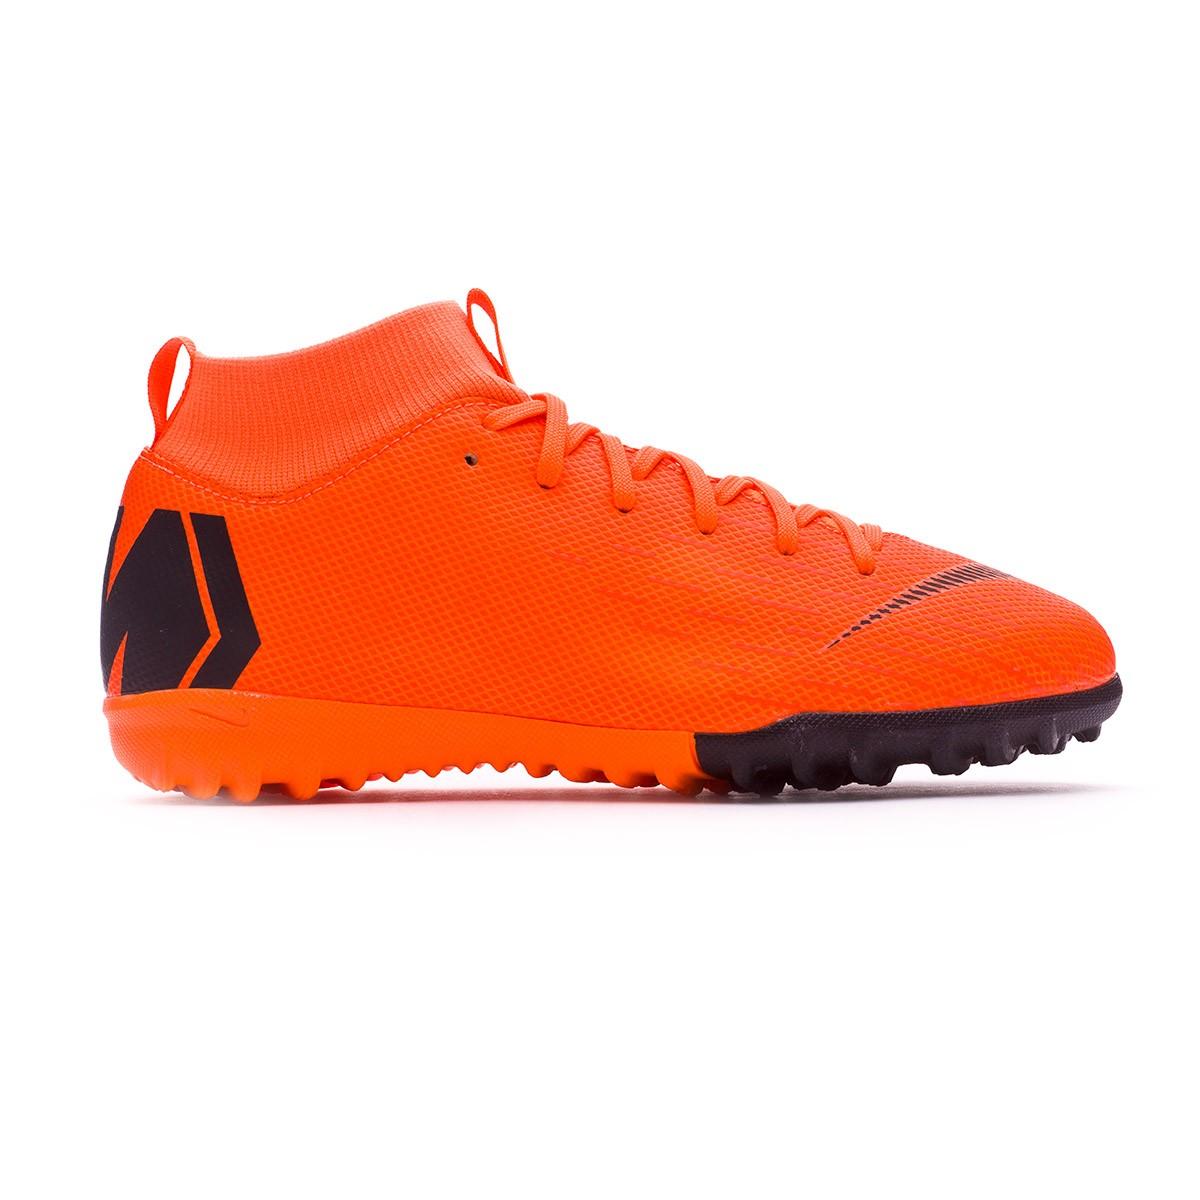 322cab98908 Football Boot Nike Kids Mercurial SuperflyX VI Academy GS Turf Total orange- Black-Volt - Tienda de fútbol Fútbol Emotion